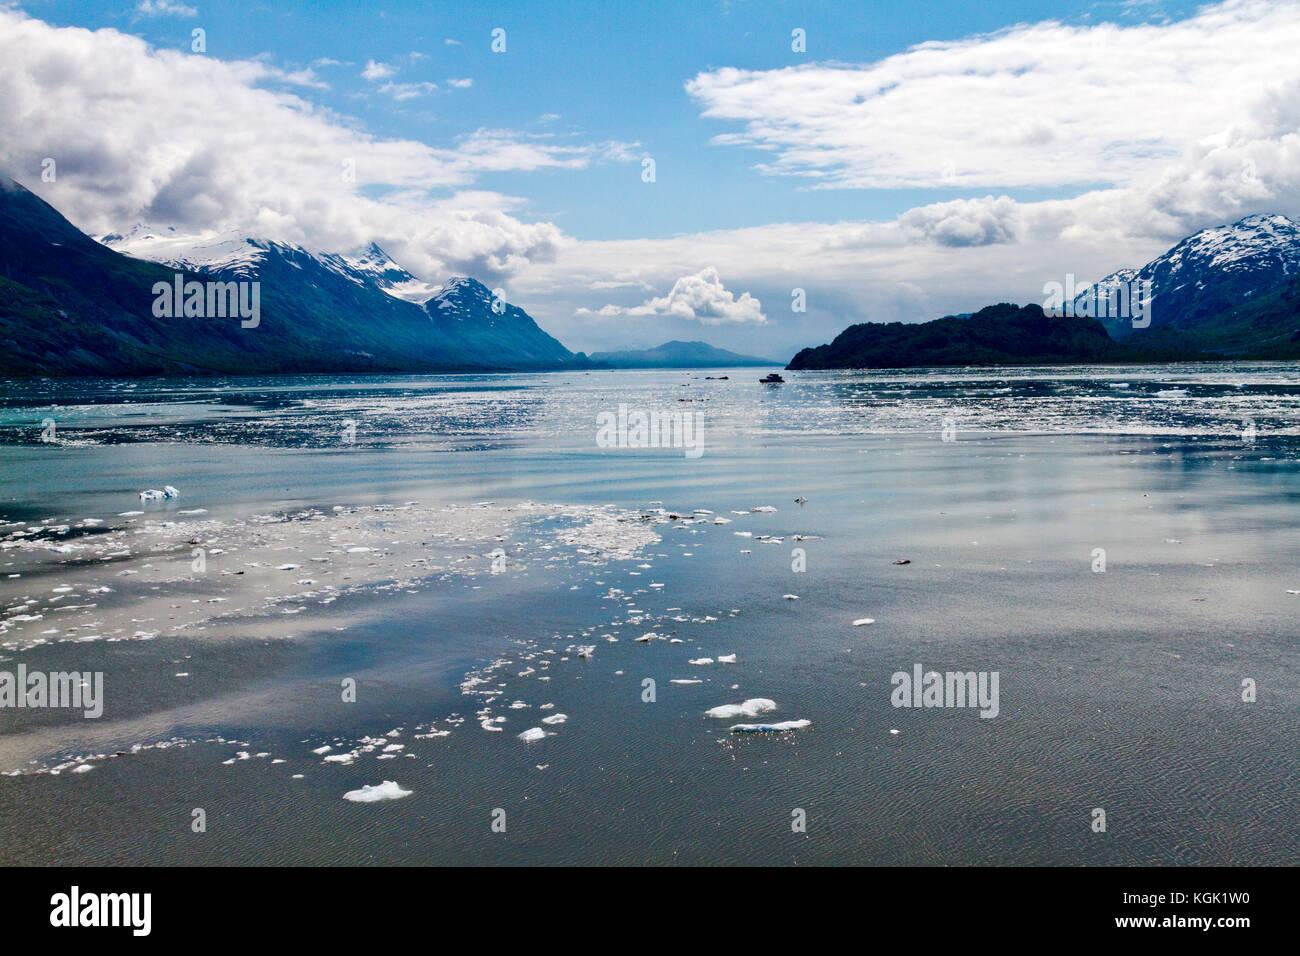 A small boat. alone and dwarfed, traveling on Glacier Bay, Alaska. - Stock Image